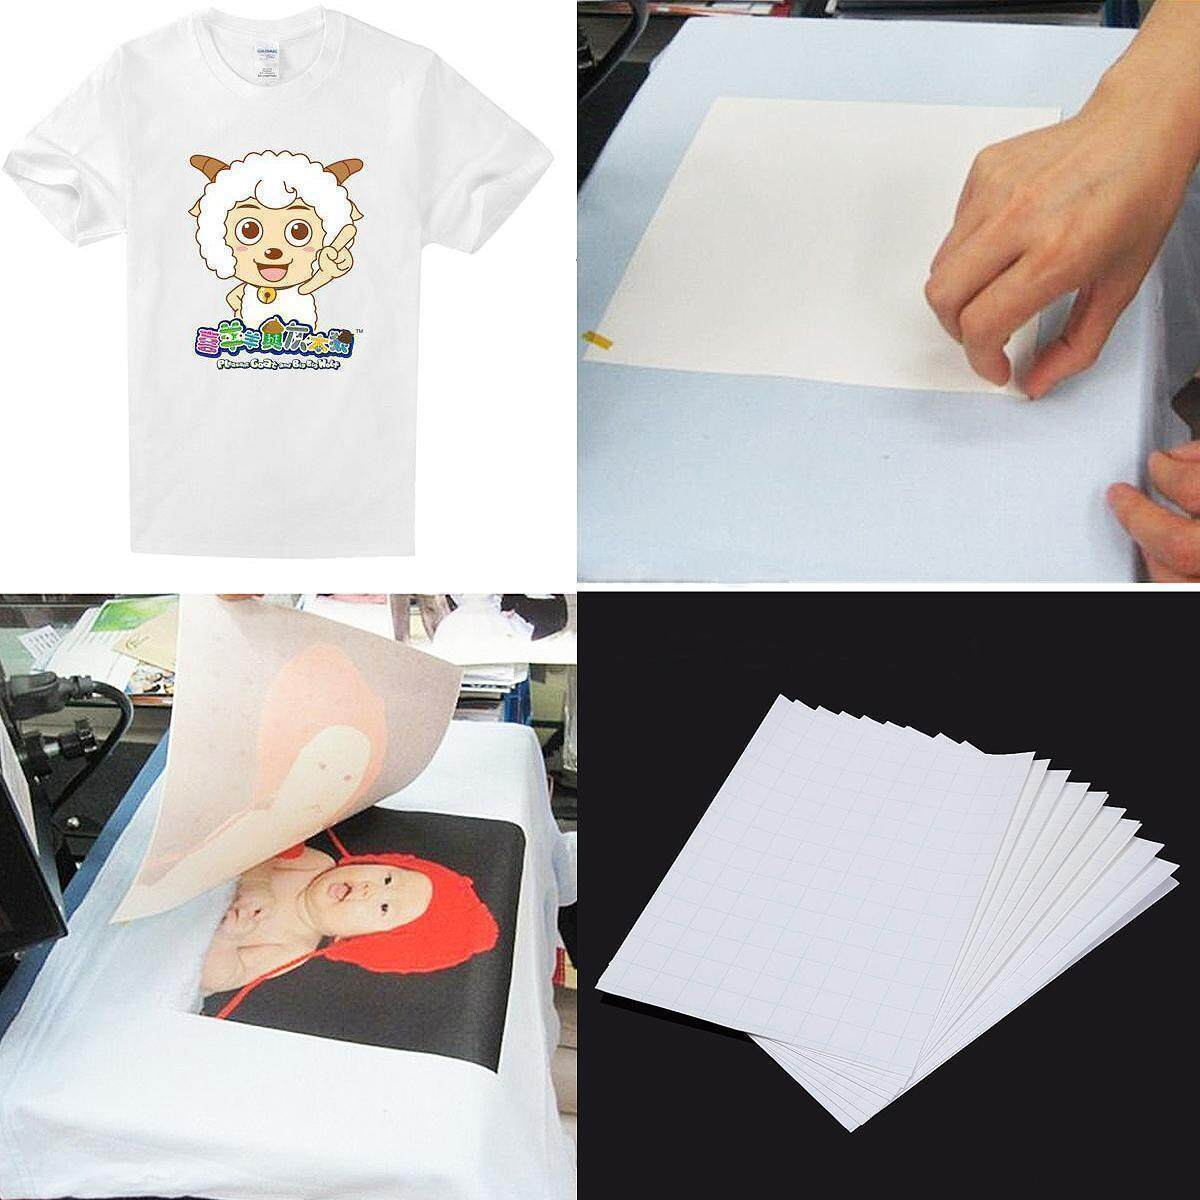 Sublimation Paper For Cotton T Shirts - Nils Stucki